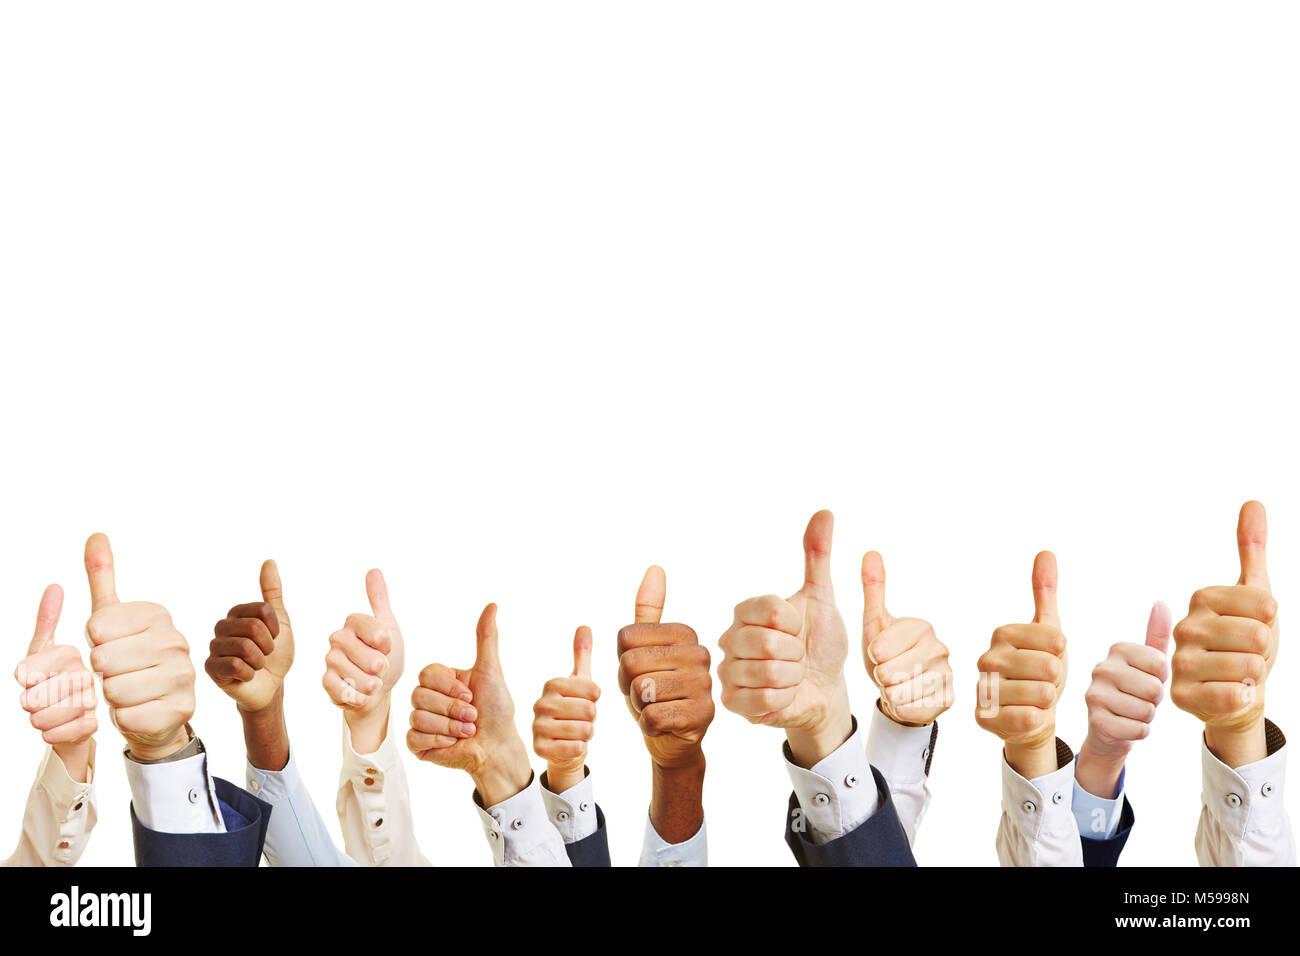 Technology Management Image: Businessman Holding Hands Up Winner Stock Photos